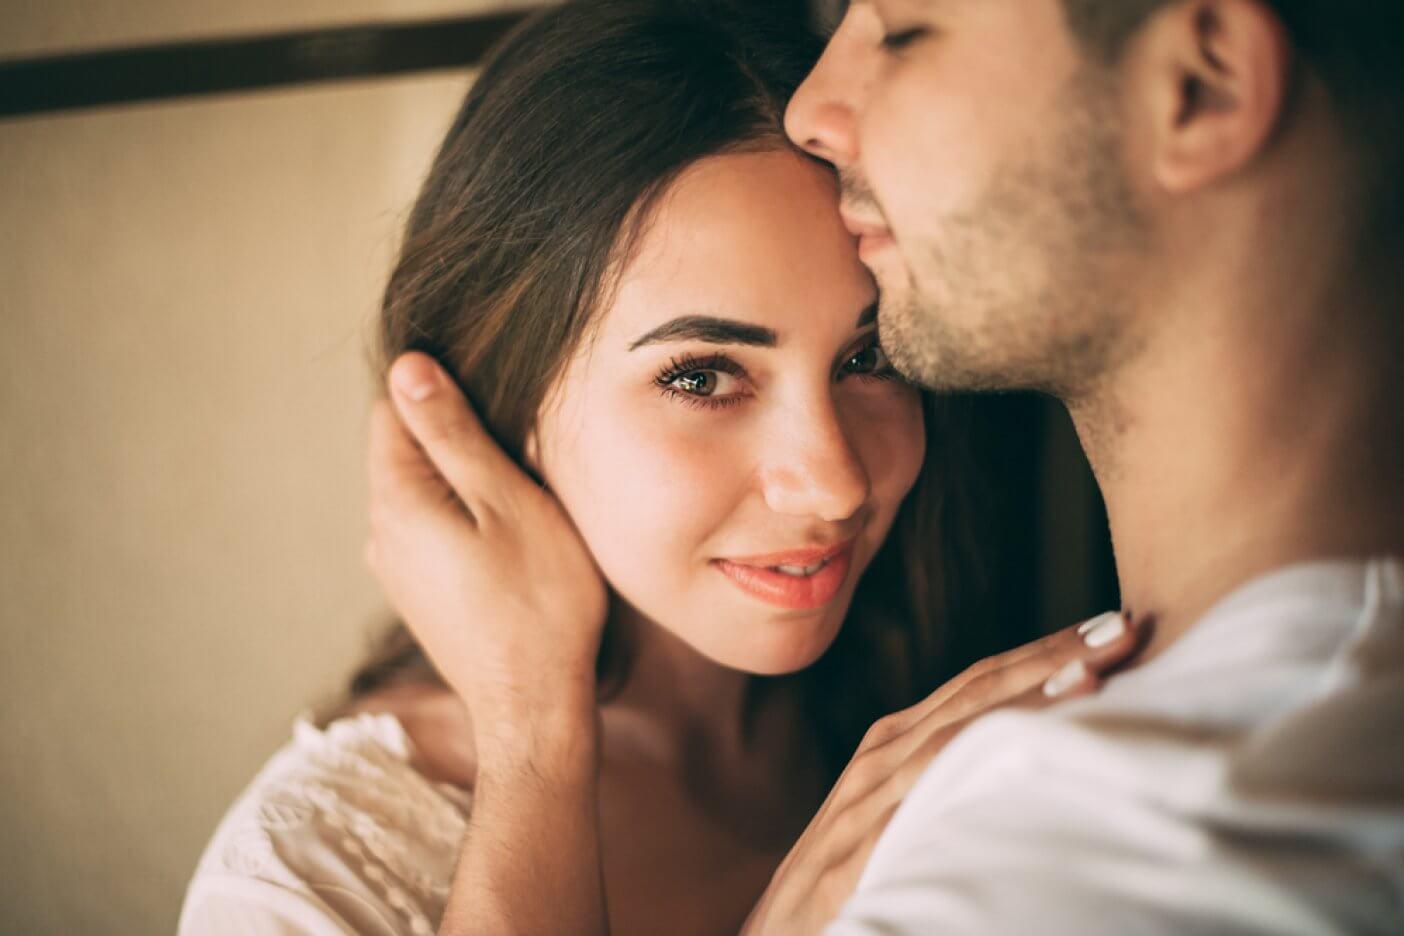 Intimità senza strategie né pugnali